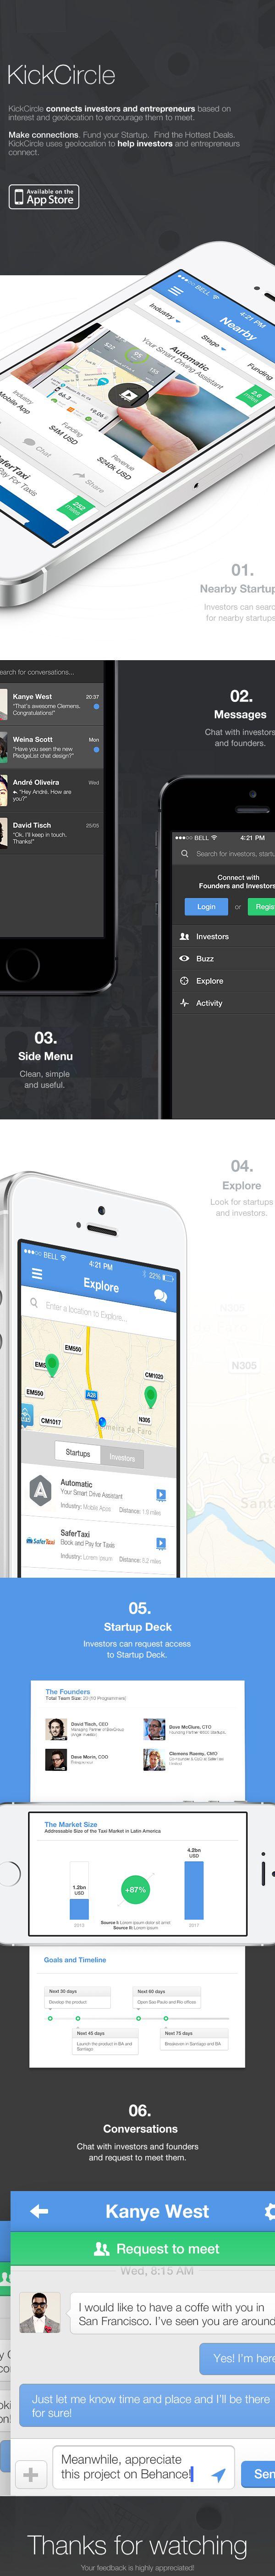 KickCircle iOS App by André Oliveira and Hélder Leal, via Behance